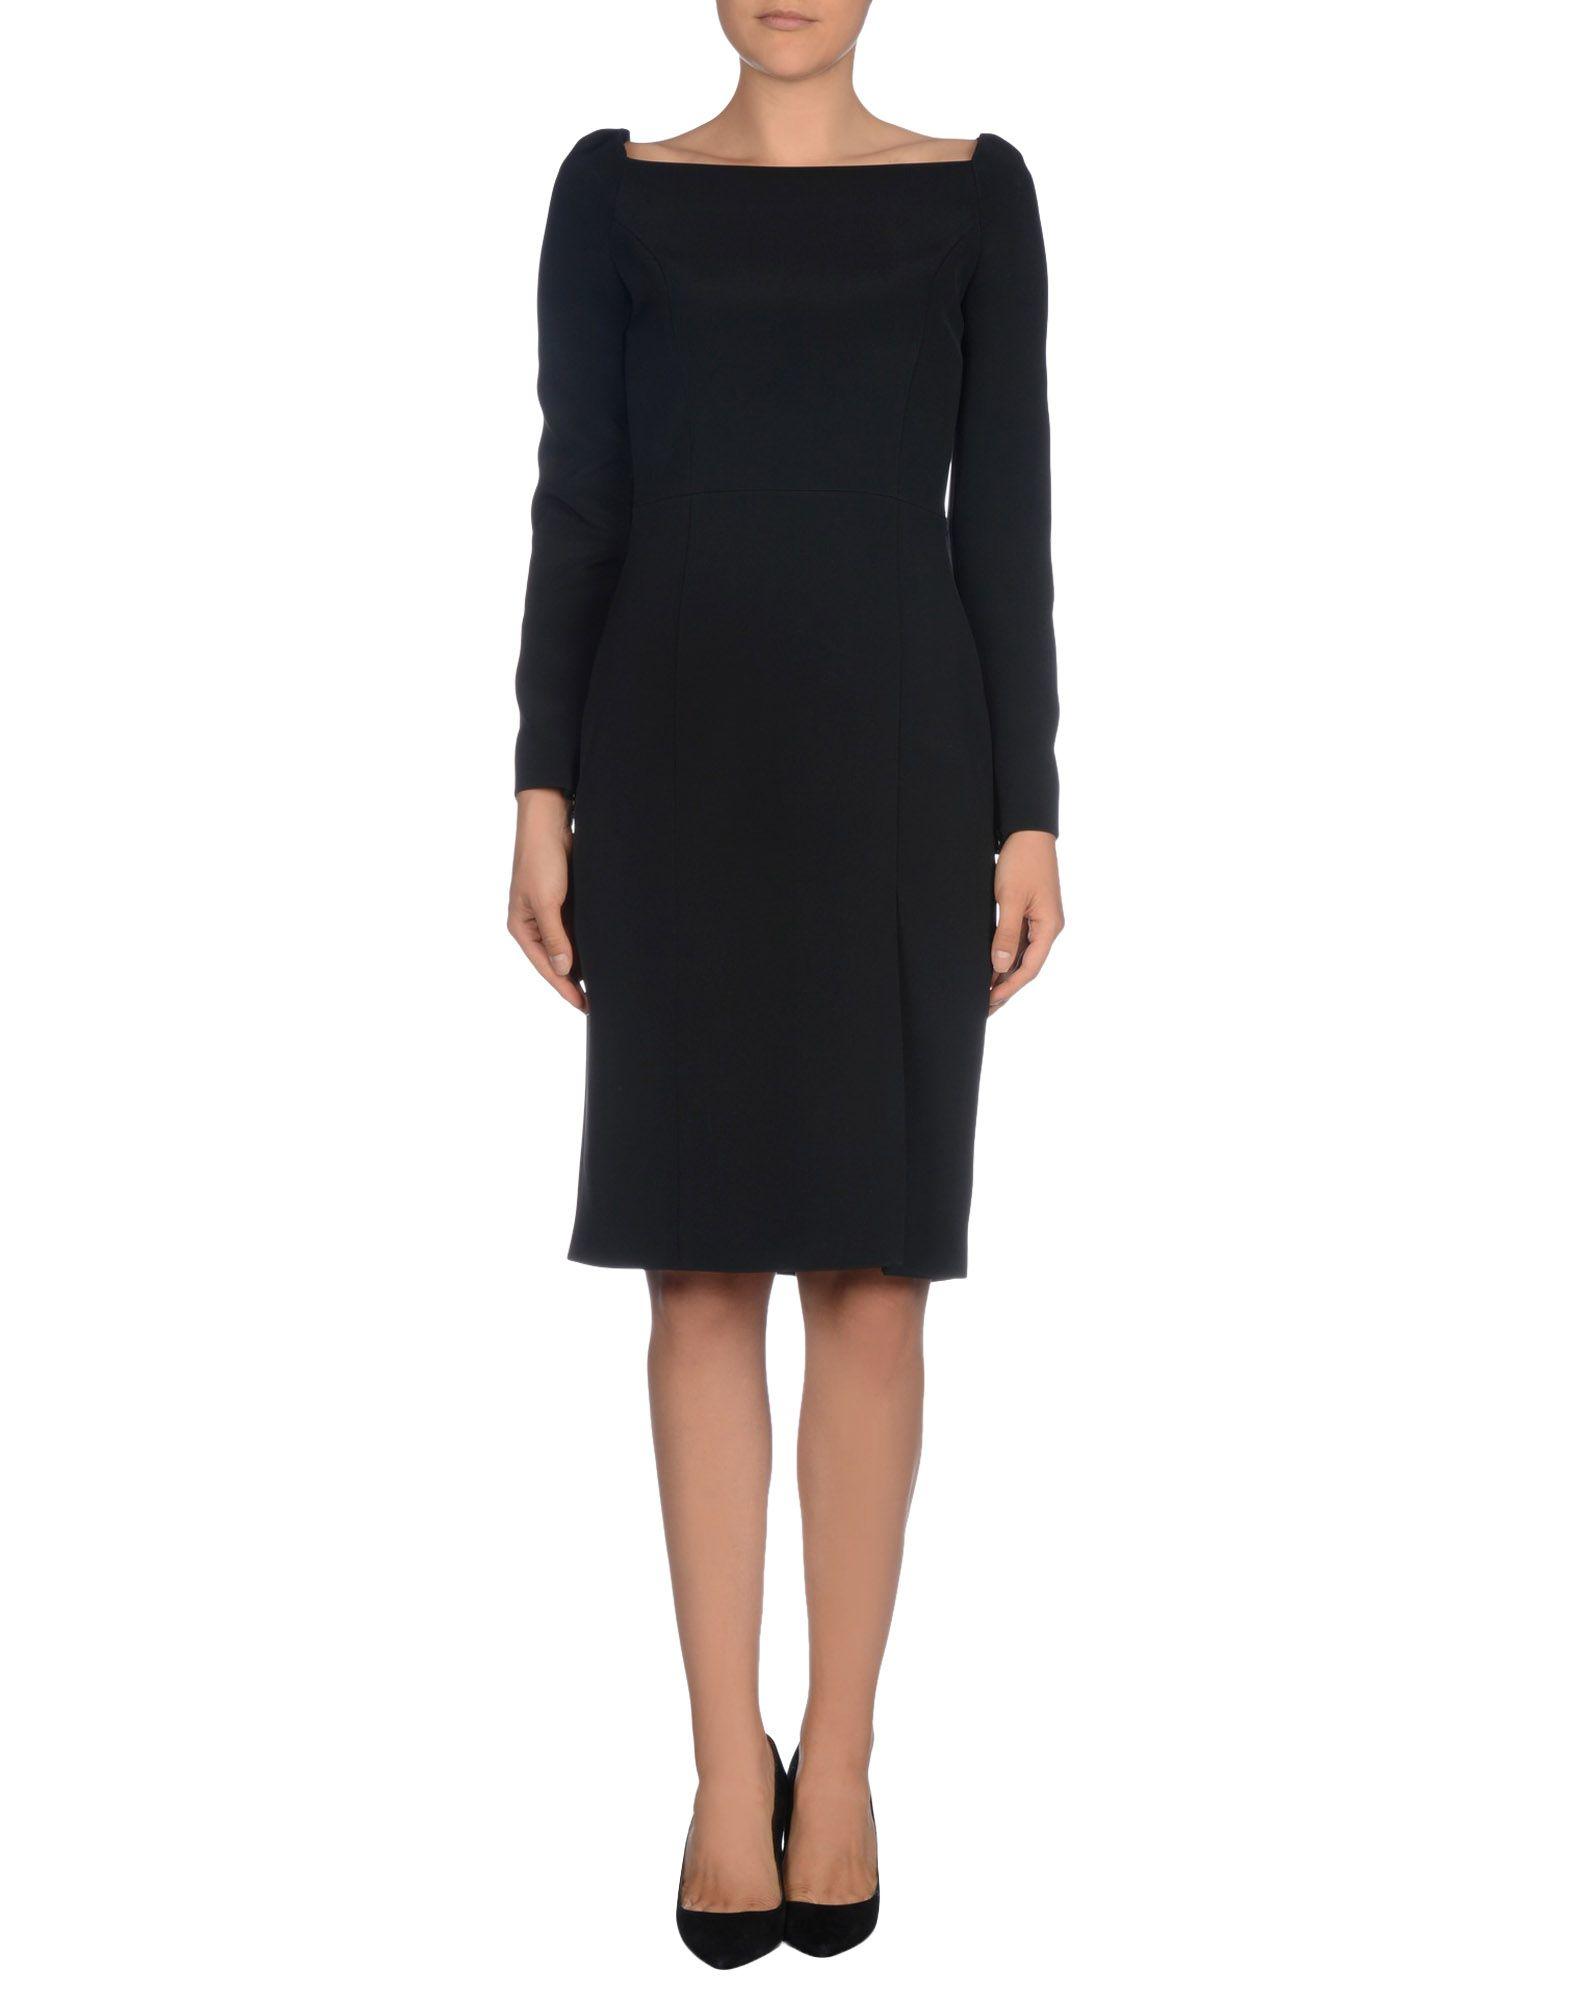 Black Dress Knee Length